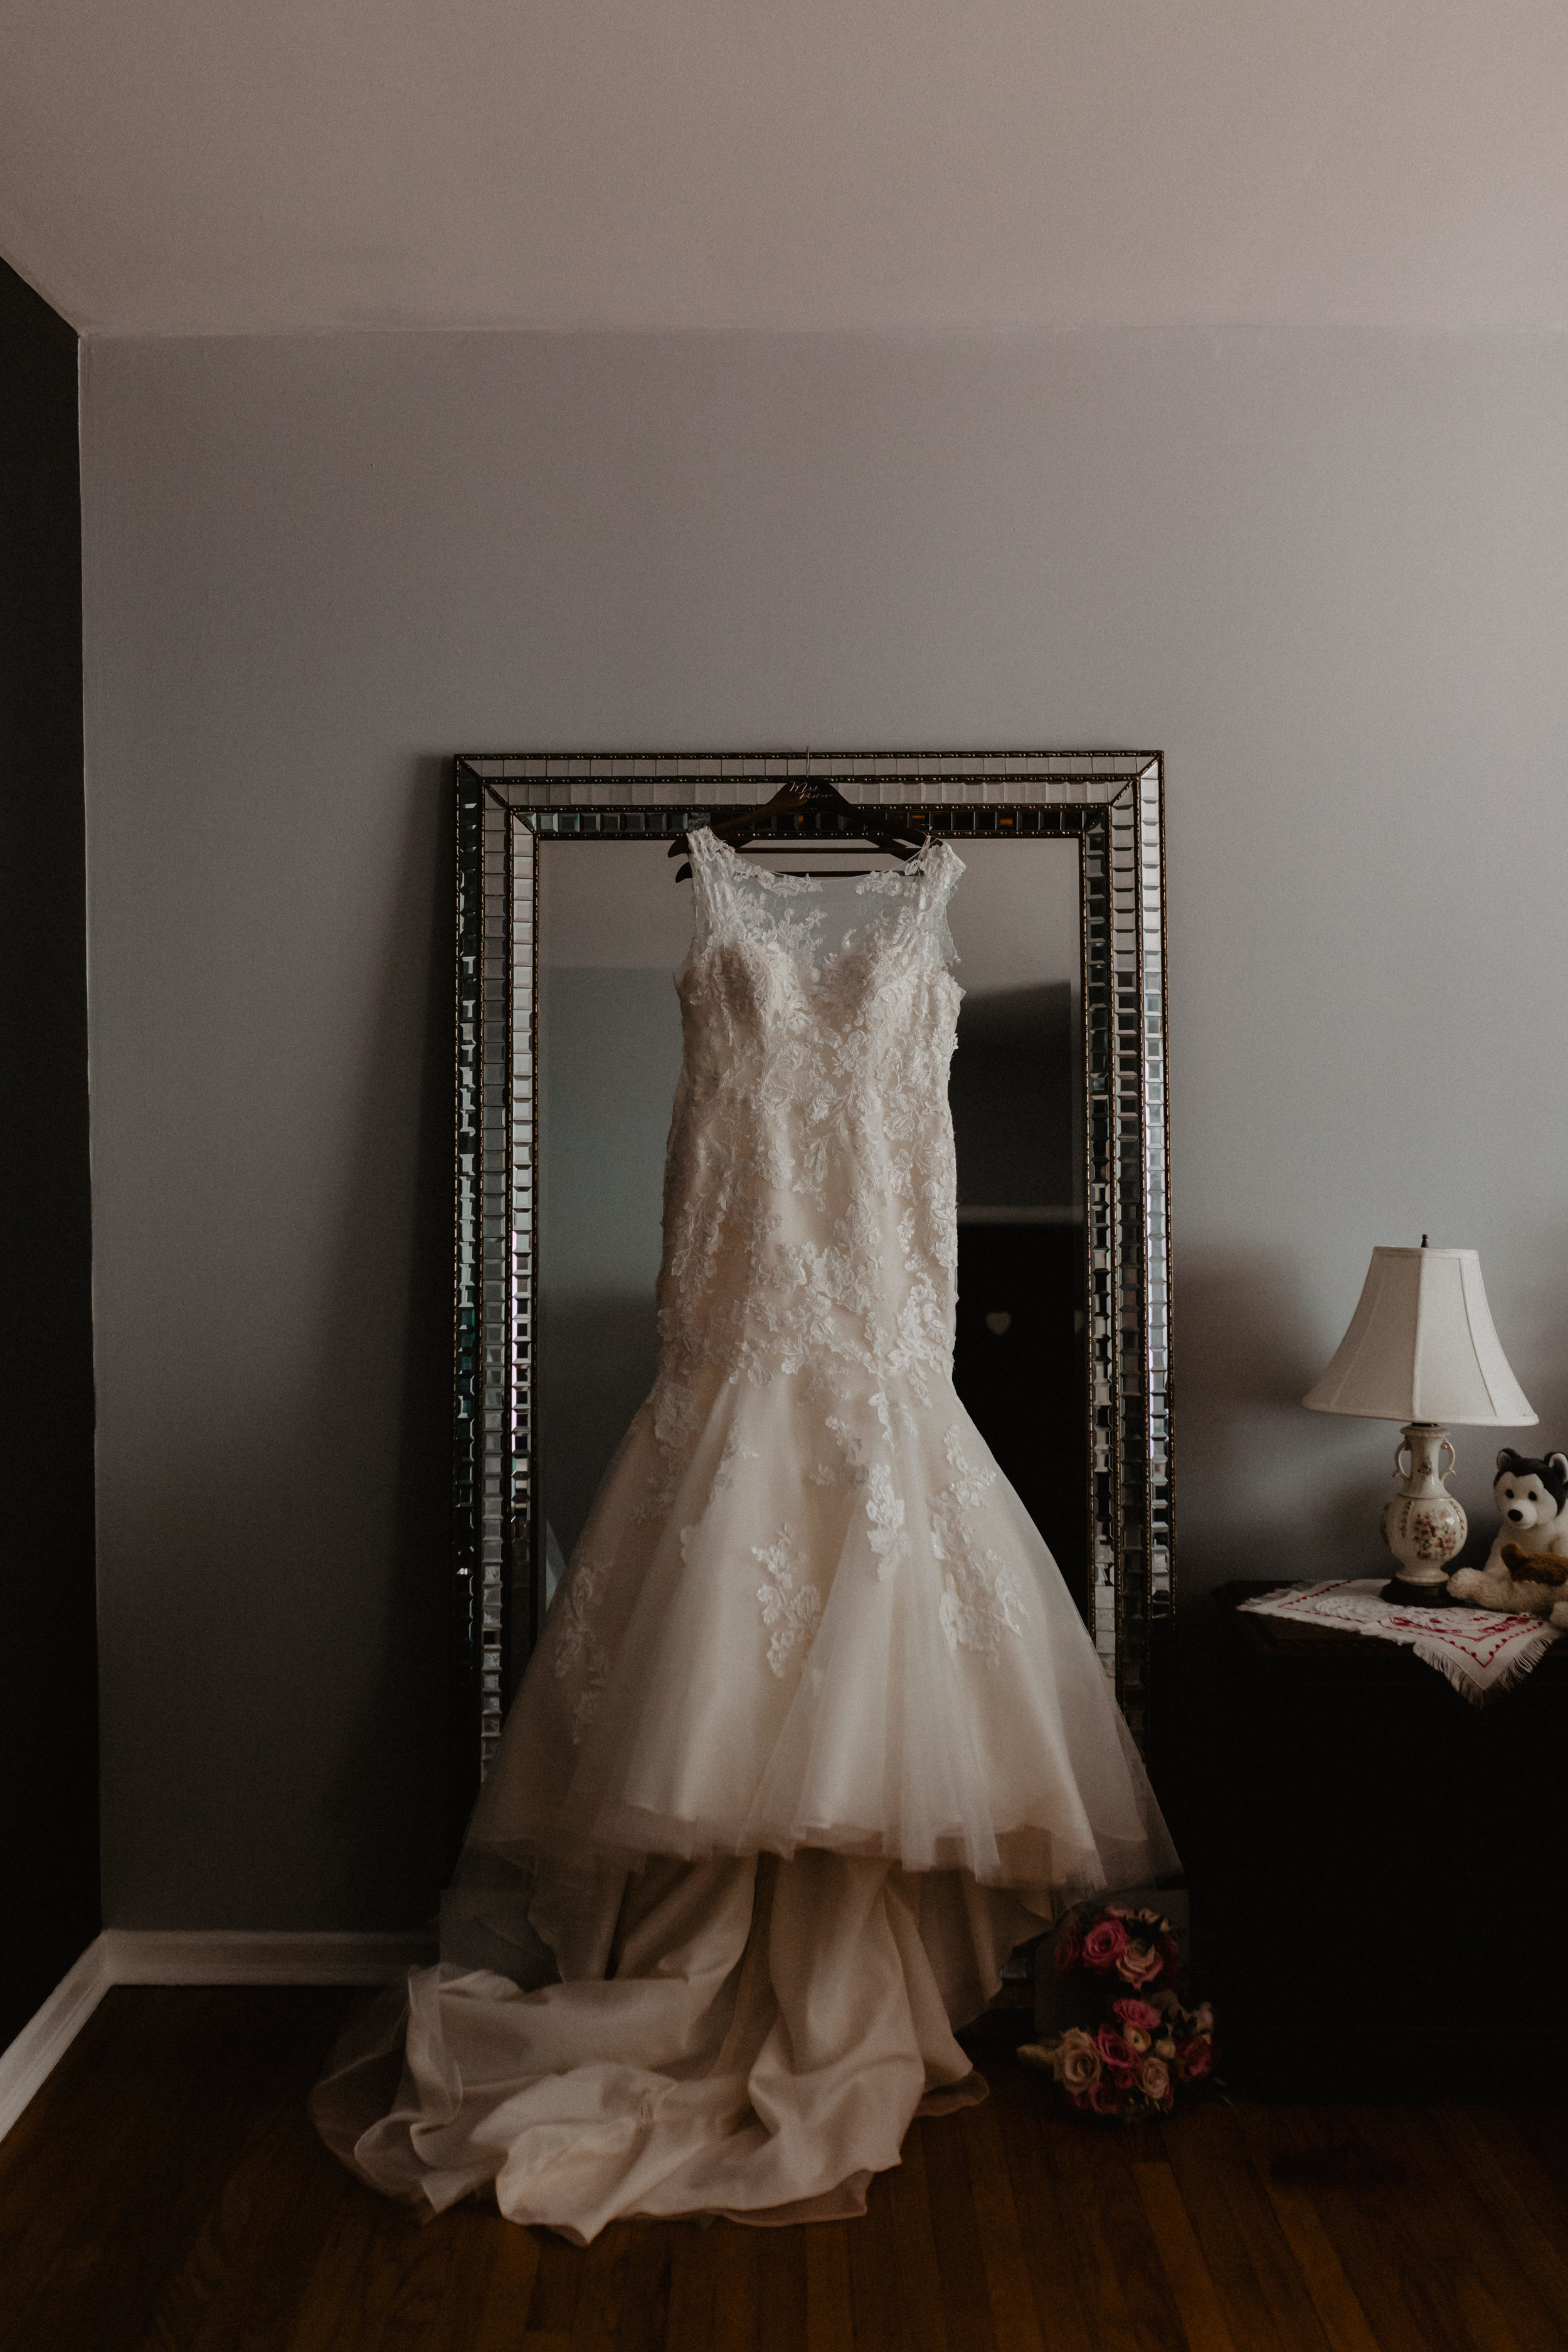 albany-new-york-wedding-10.jpg